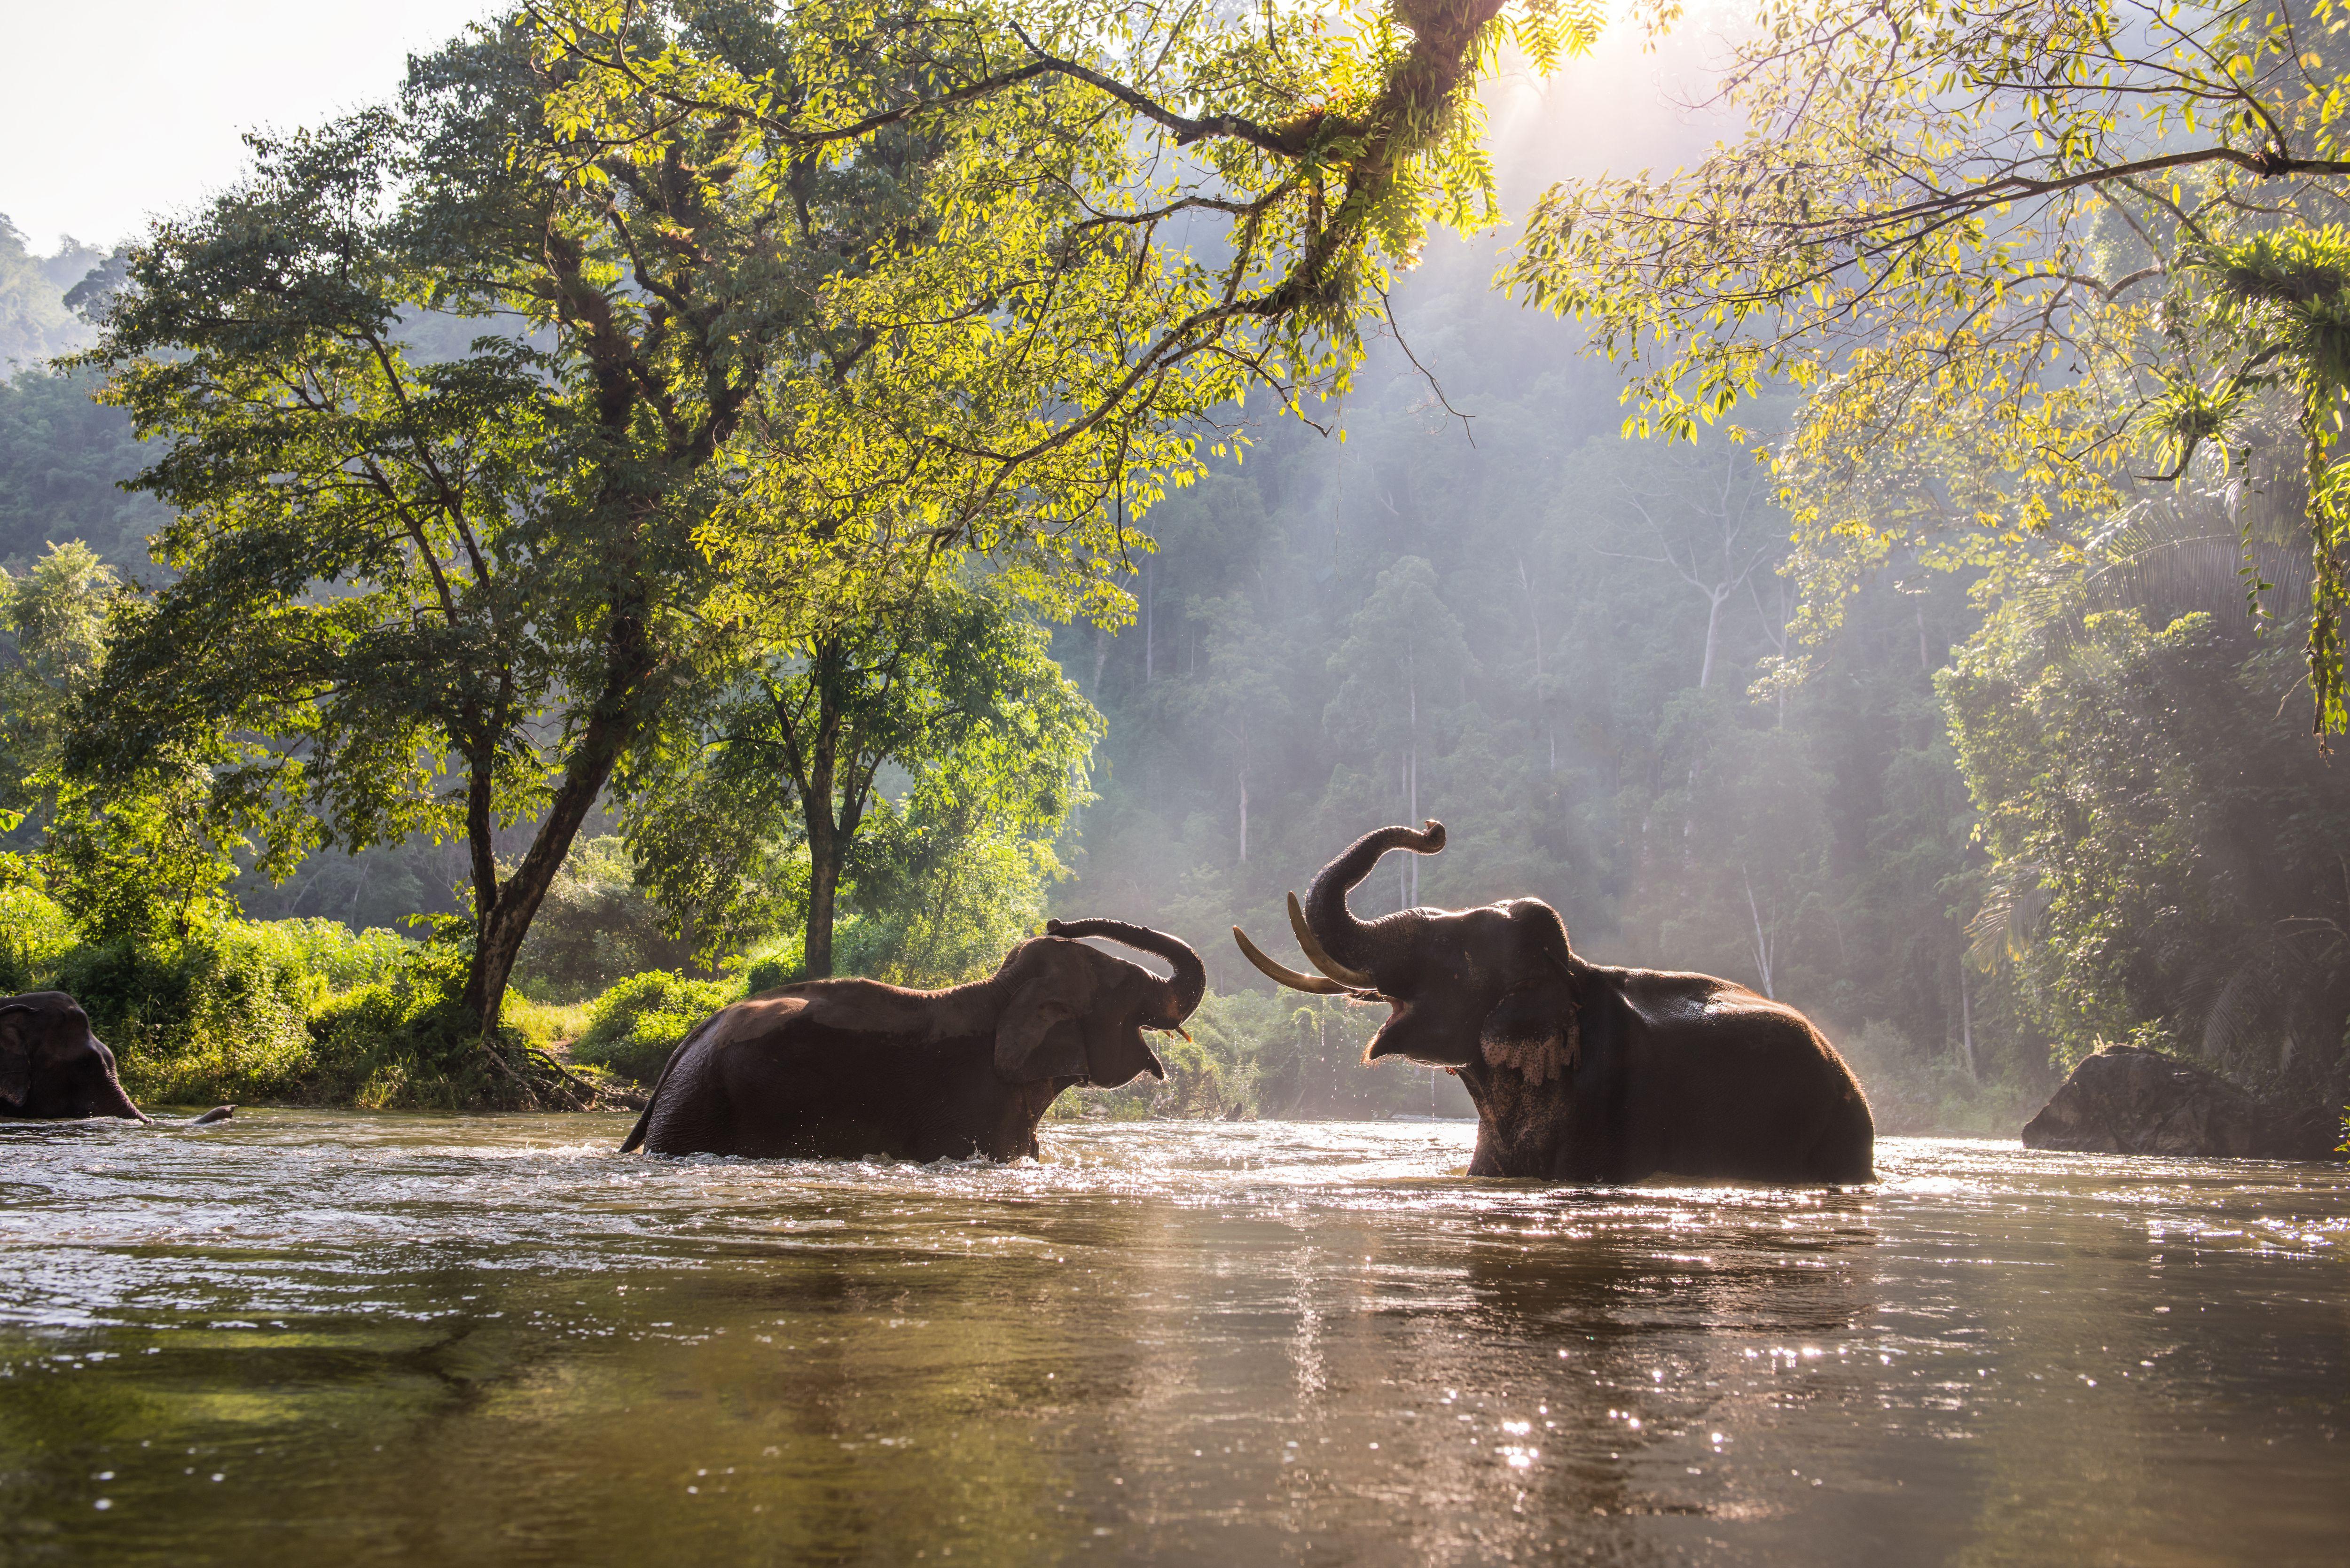 Two elephants bathing in a river near Kanchanaburi, Thailand